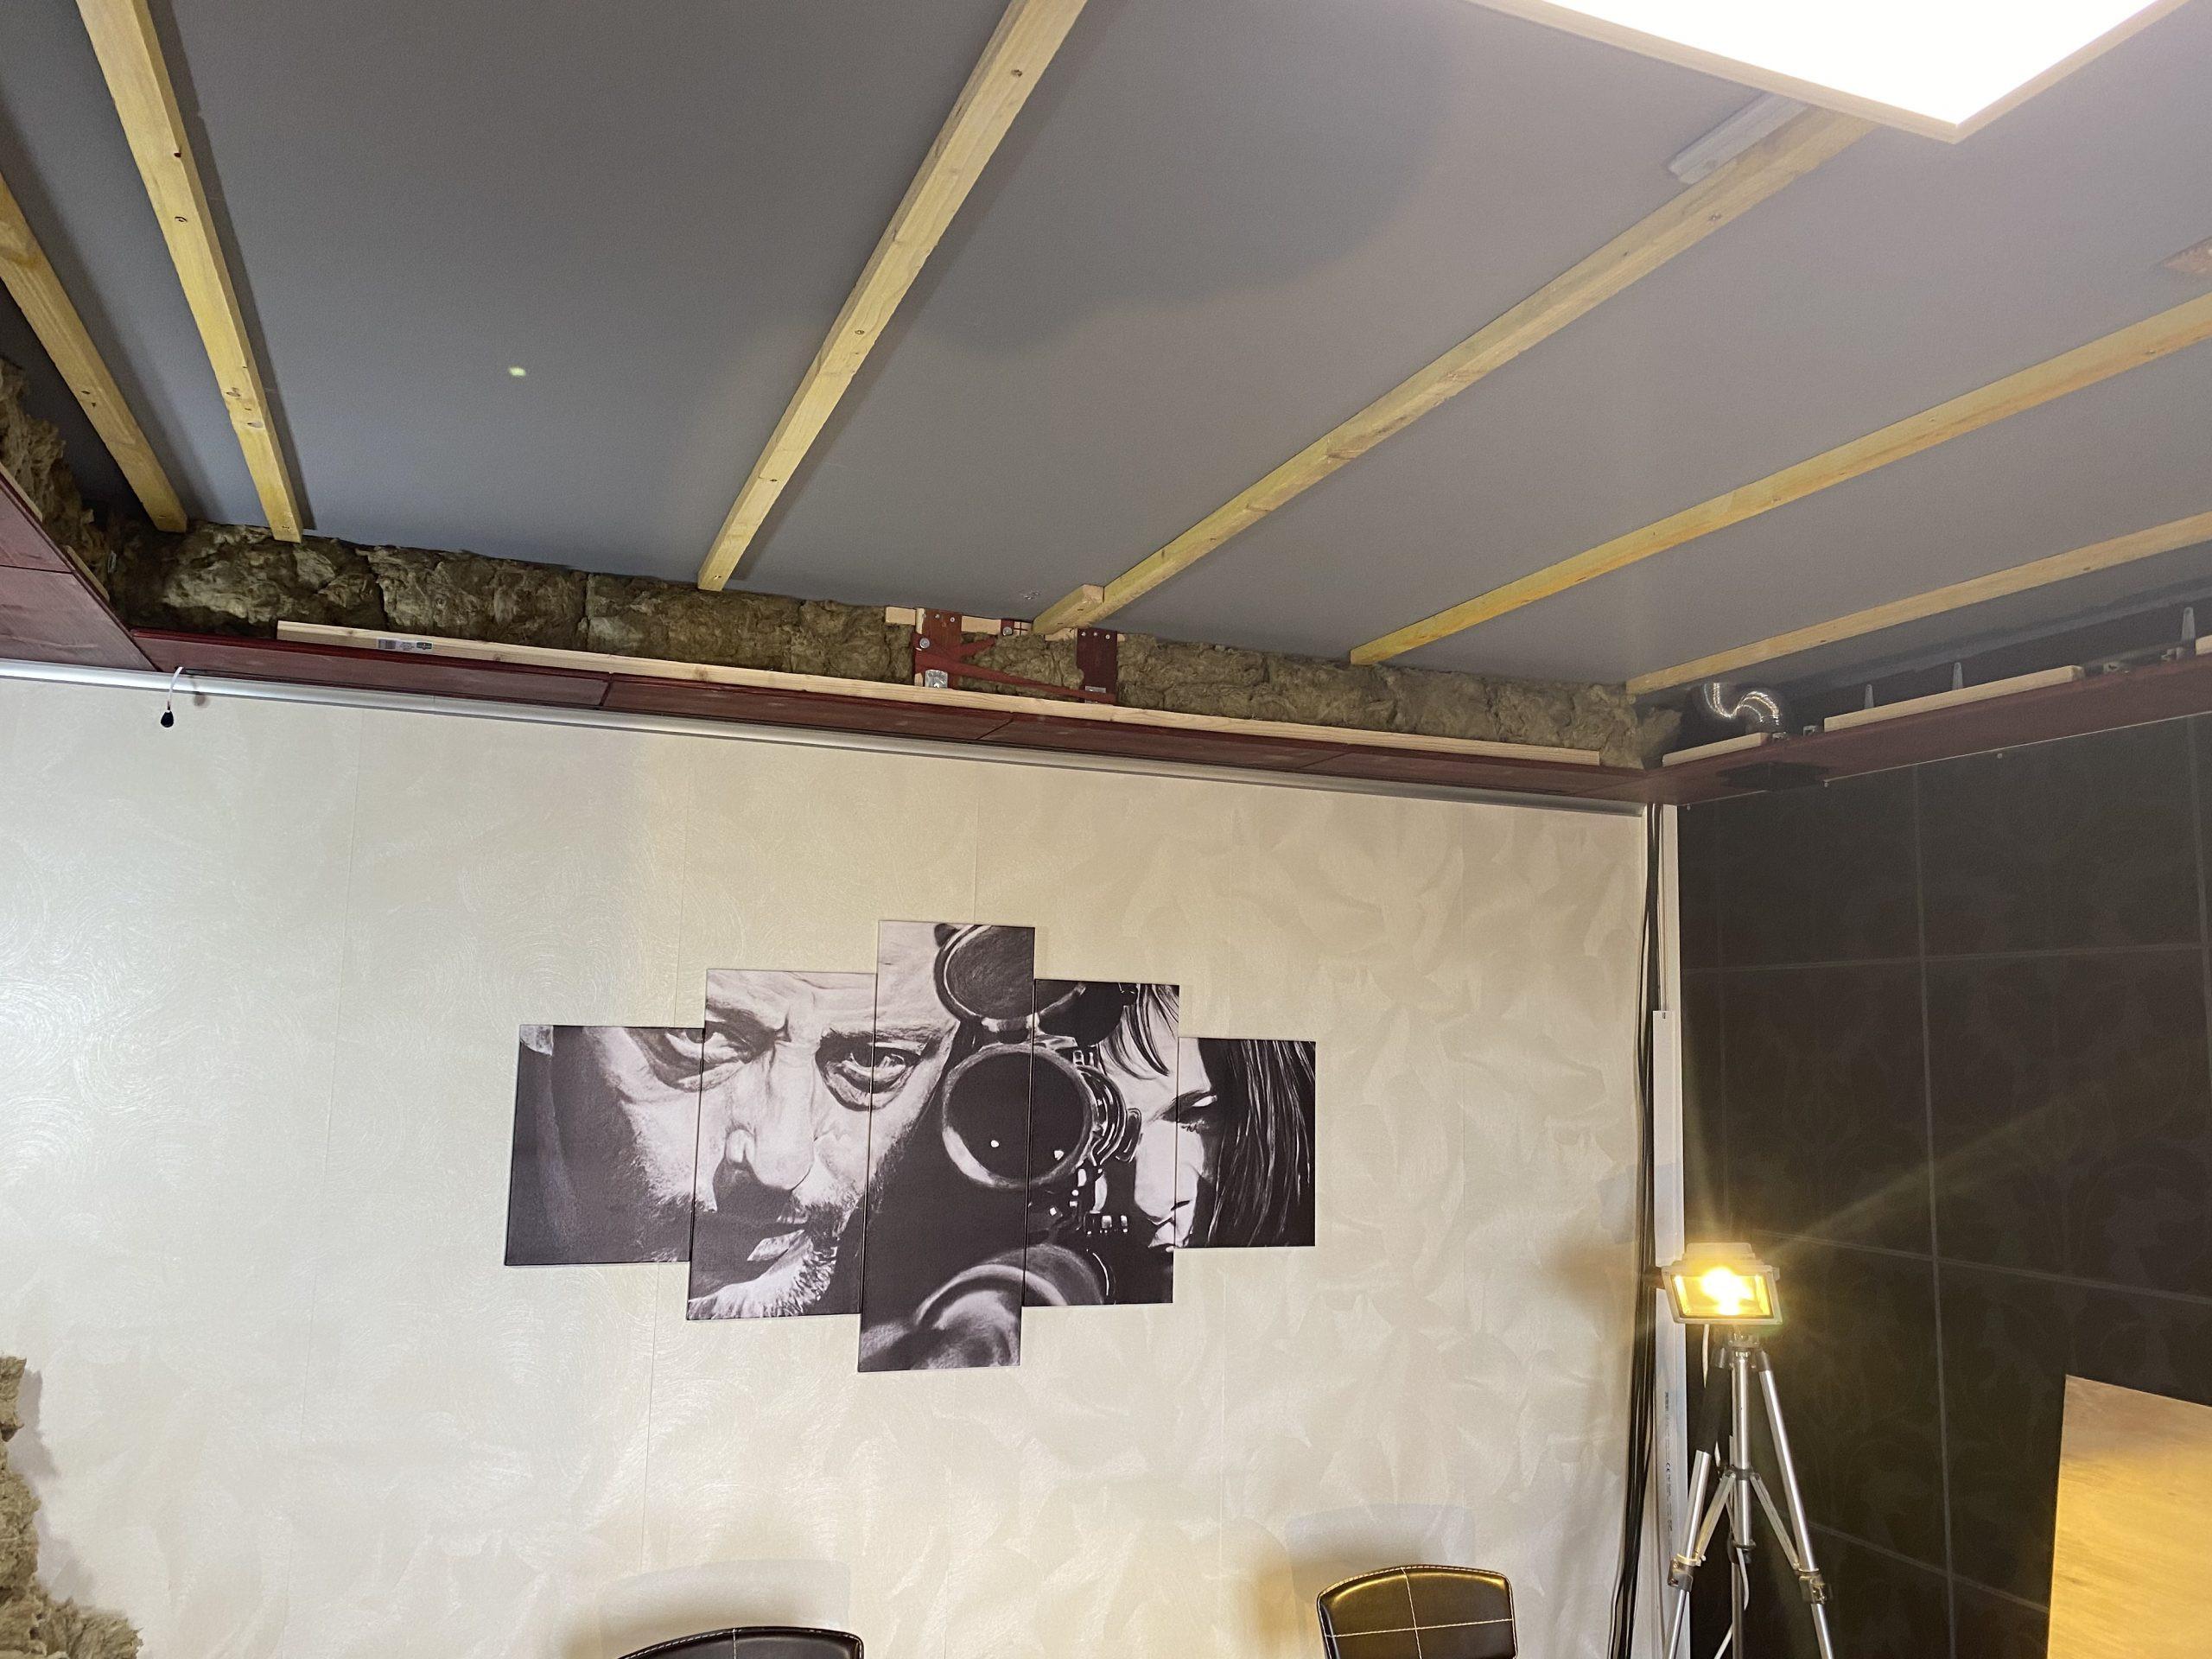 蜂蜜浏览器_mise-en-place-des-montants-pour-les-panneaux-fibres-scaled.jpg